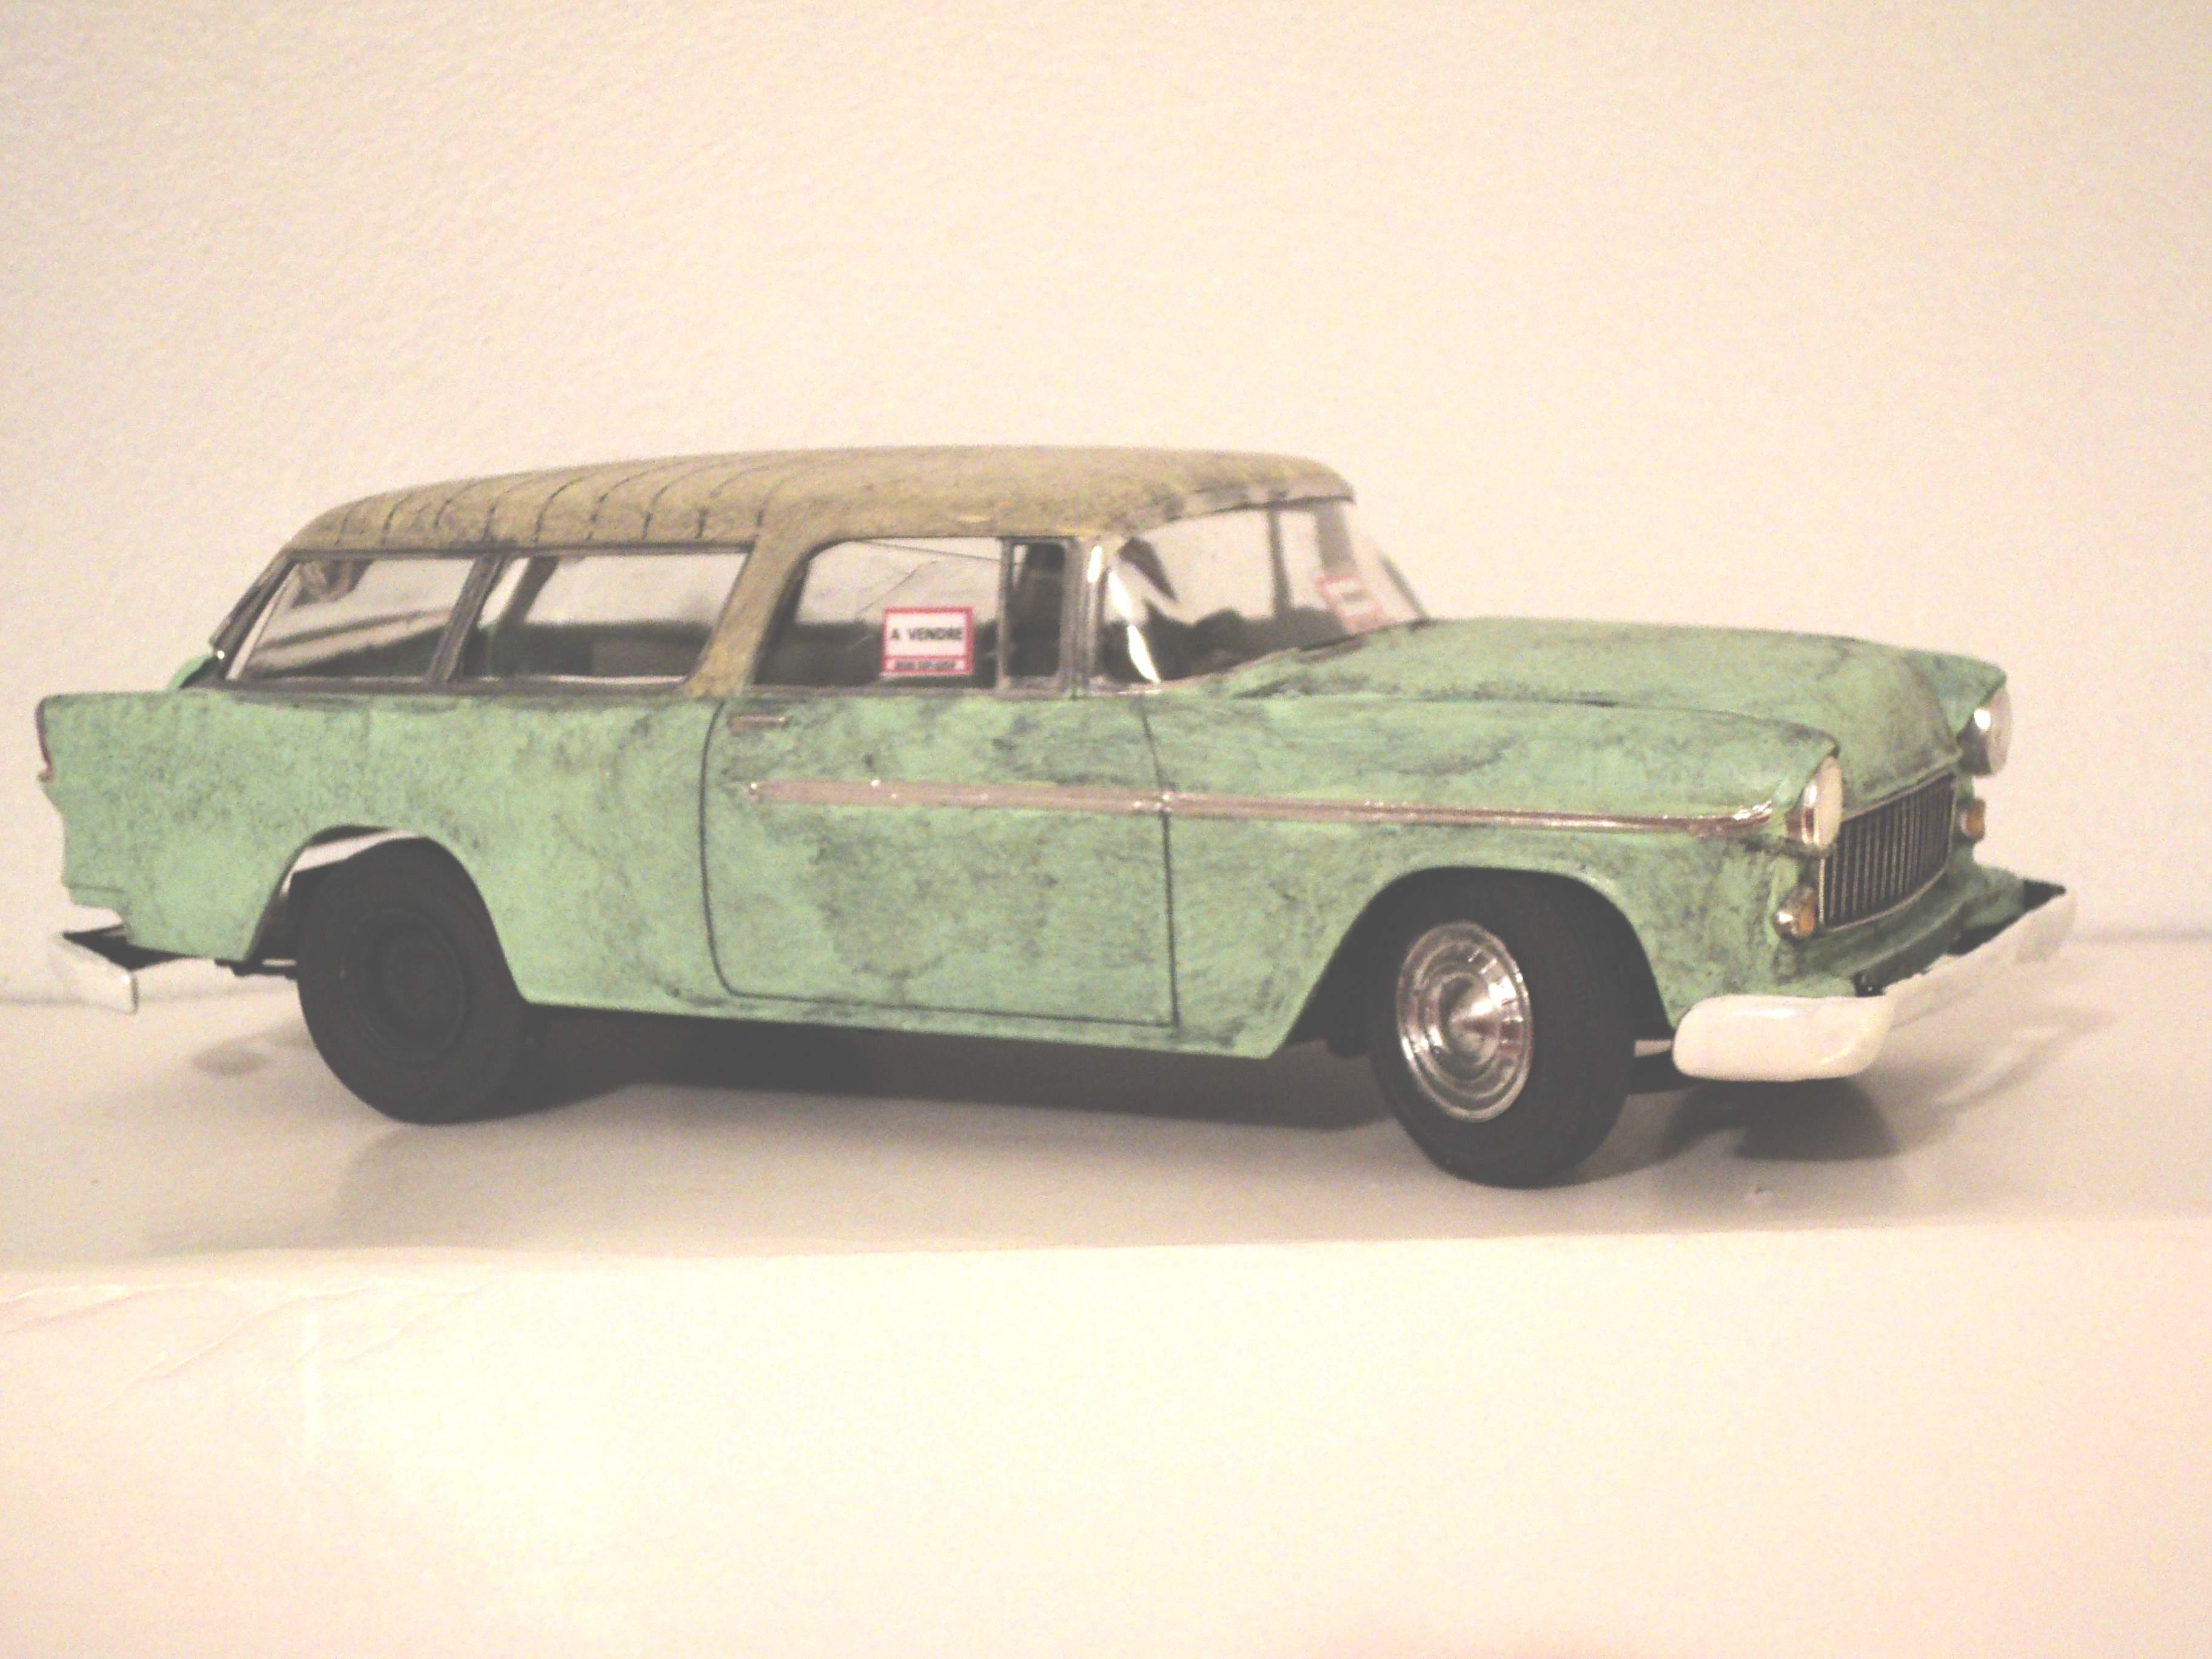 1955 Chevy Nomad (À vendre) 5699591955NomadAvendreno2